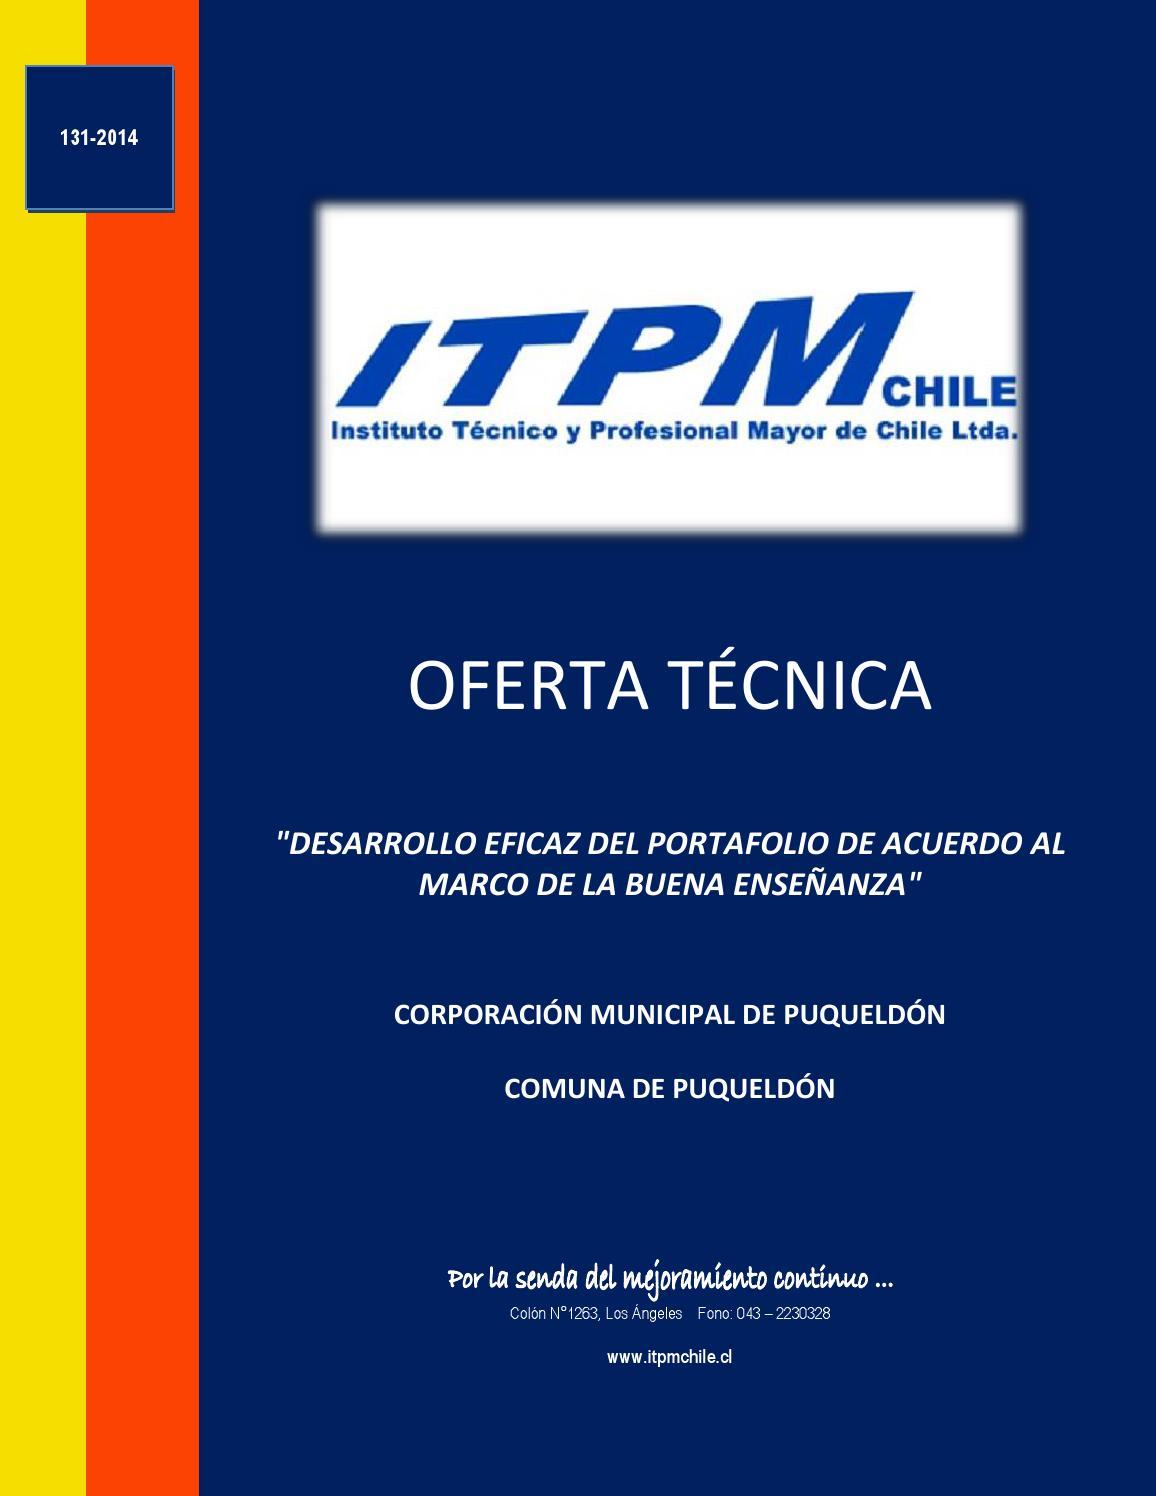 Ot 131 portafolio puqueldón by Claudio Andres Fierro Lorca - issuu